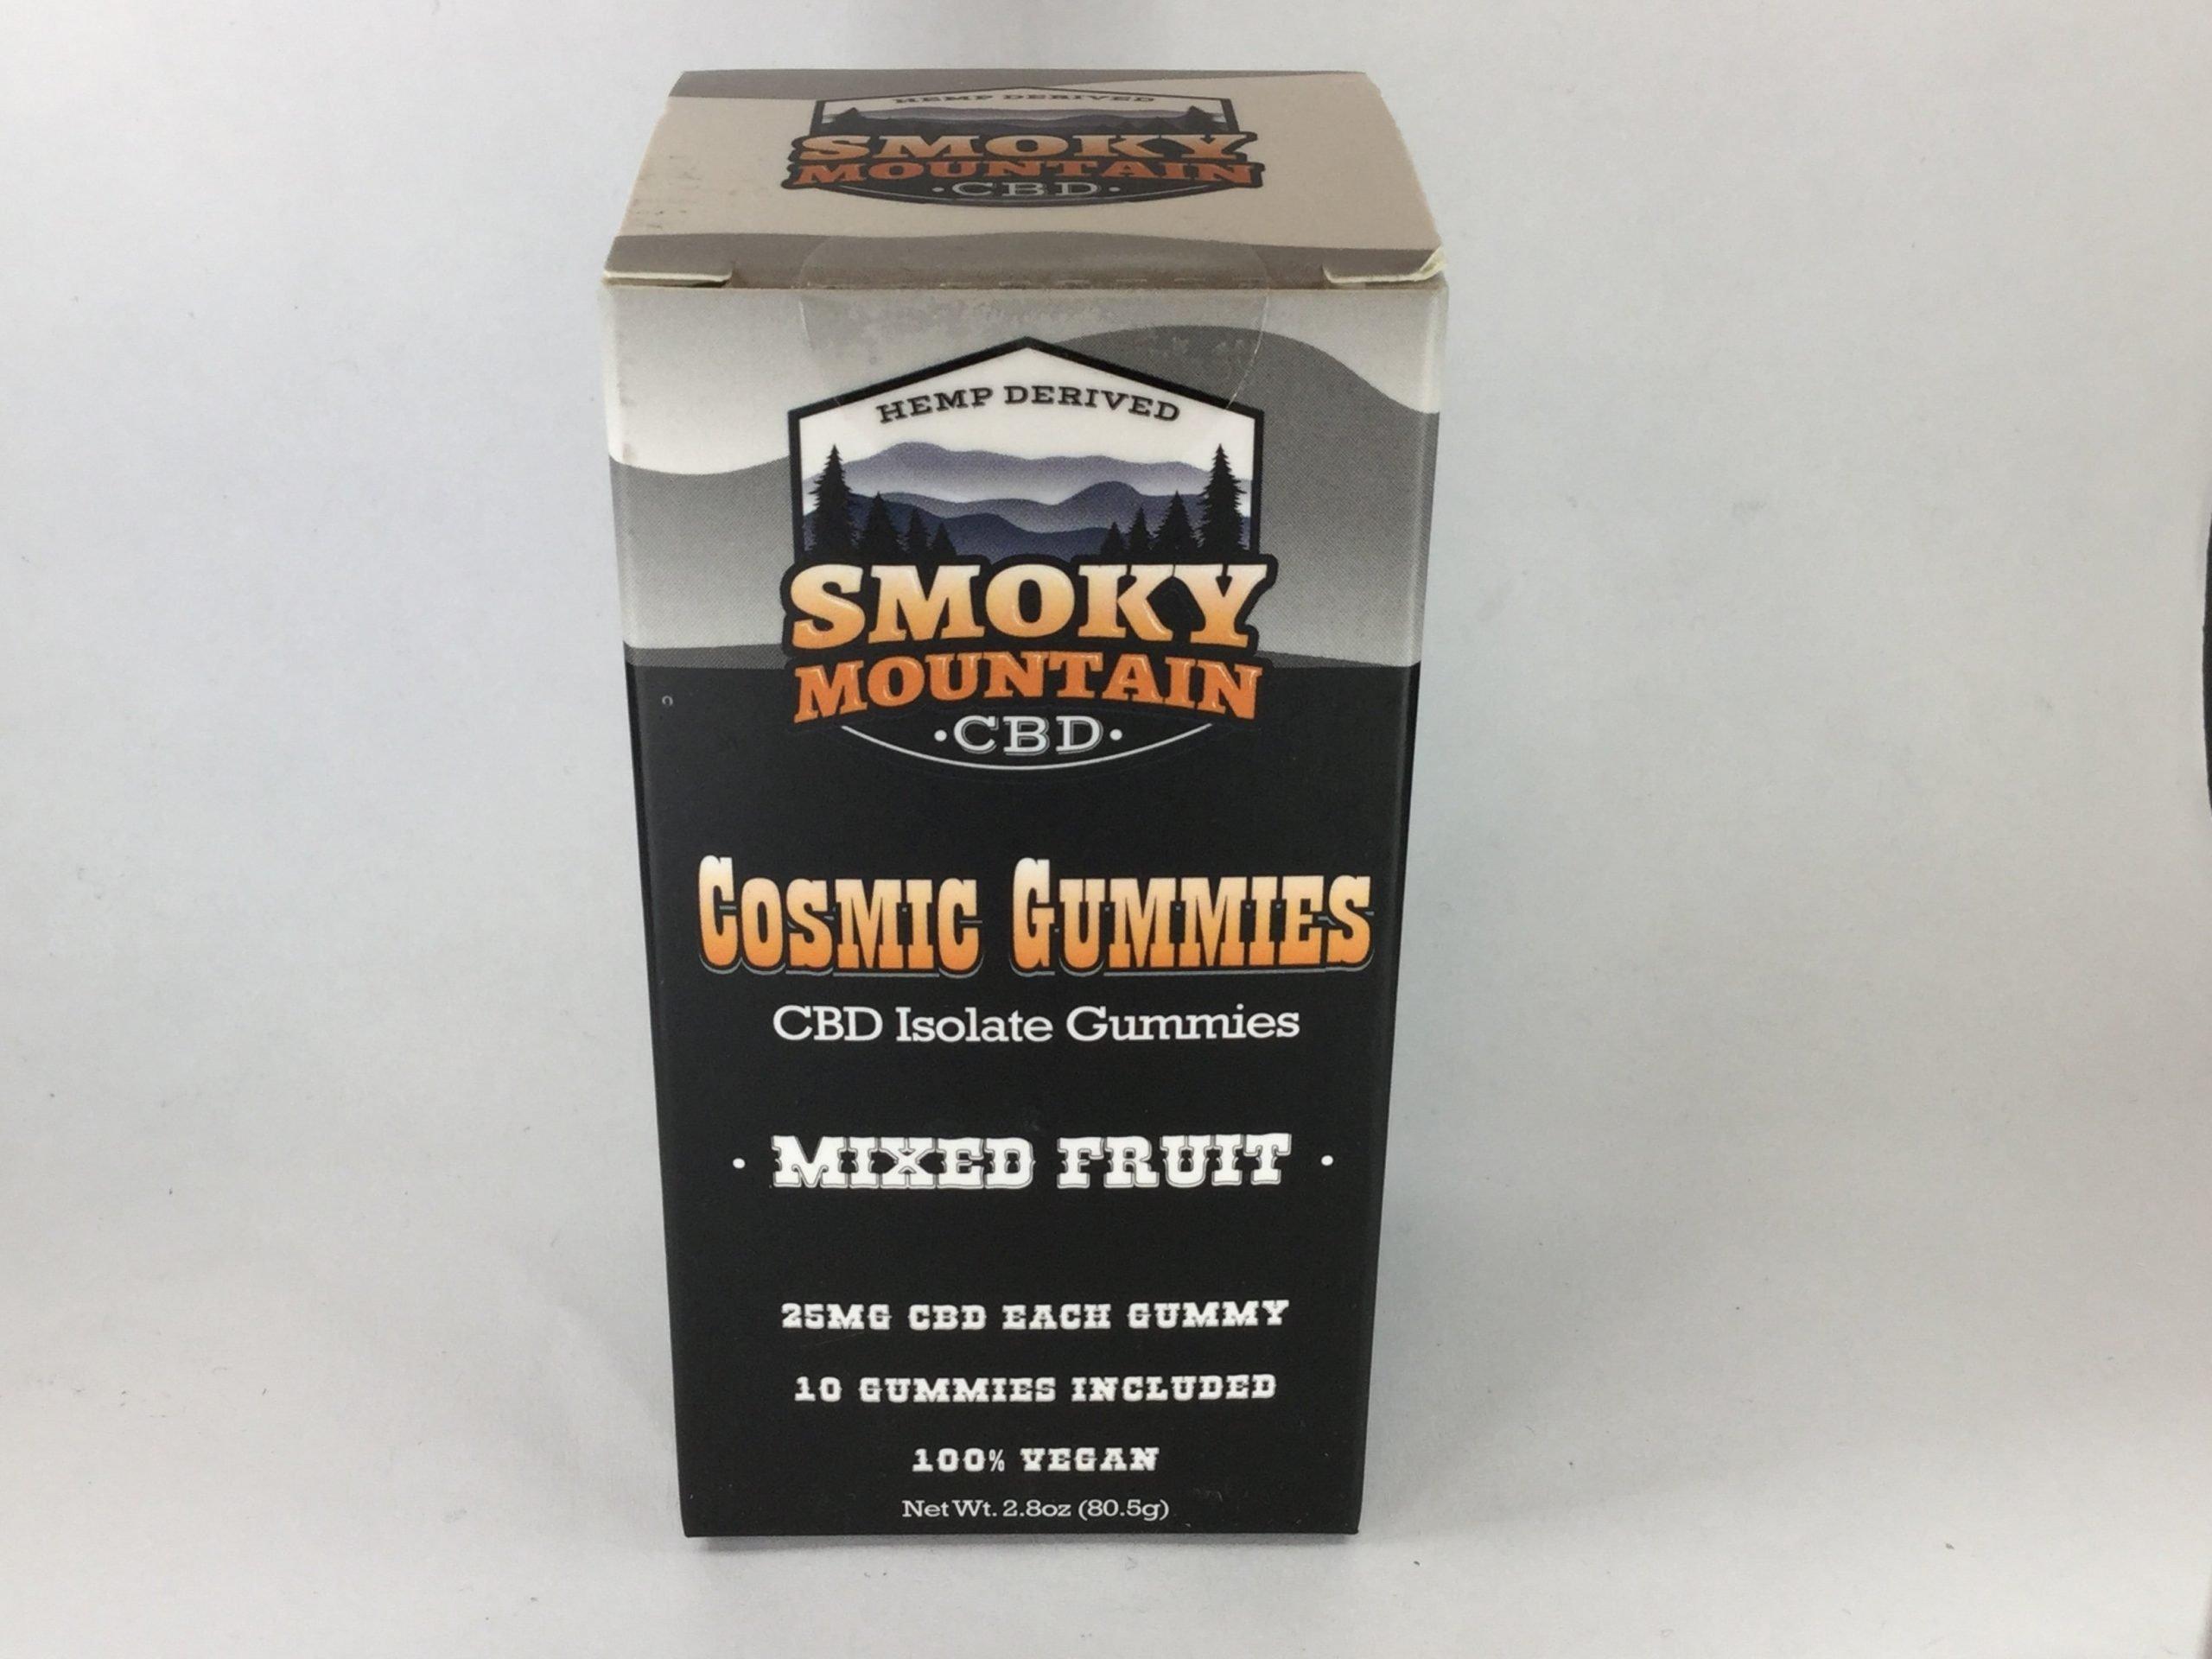 CBD near me Smoky Mountain CBD cosmic gummies mixed fruit 25mg 250mg per box Hemp House Knoxville Made in Tennessee